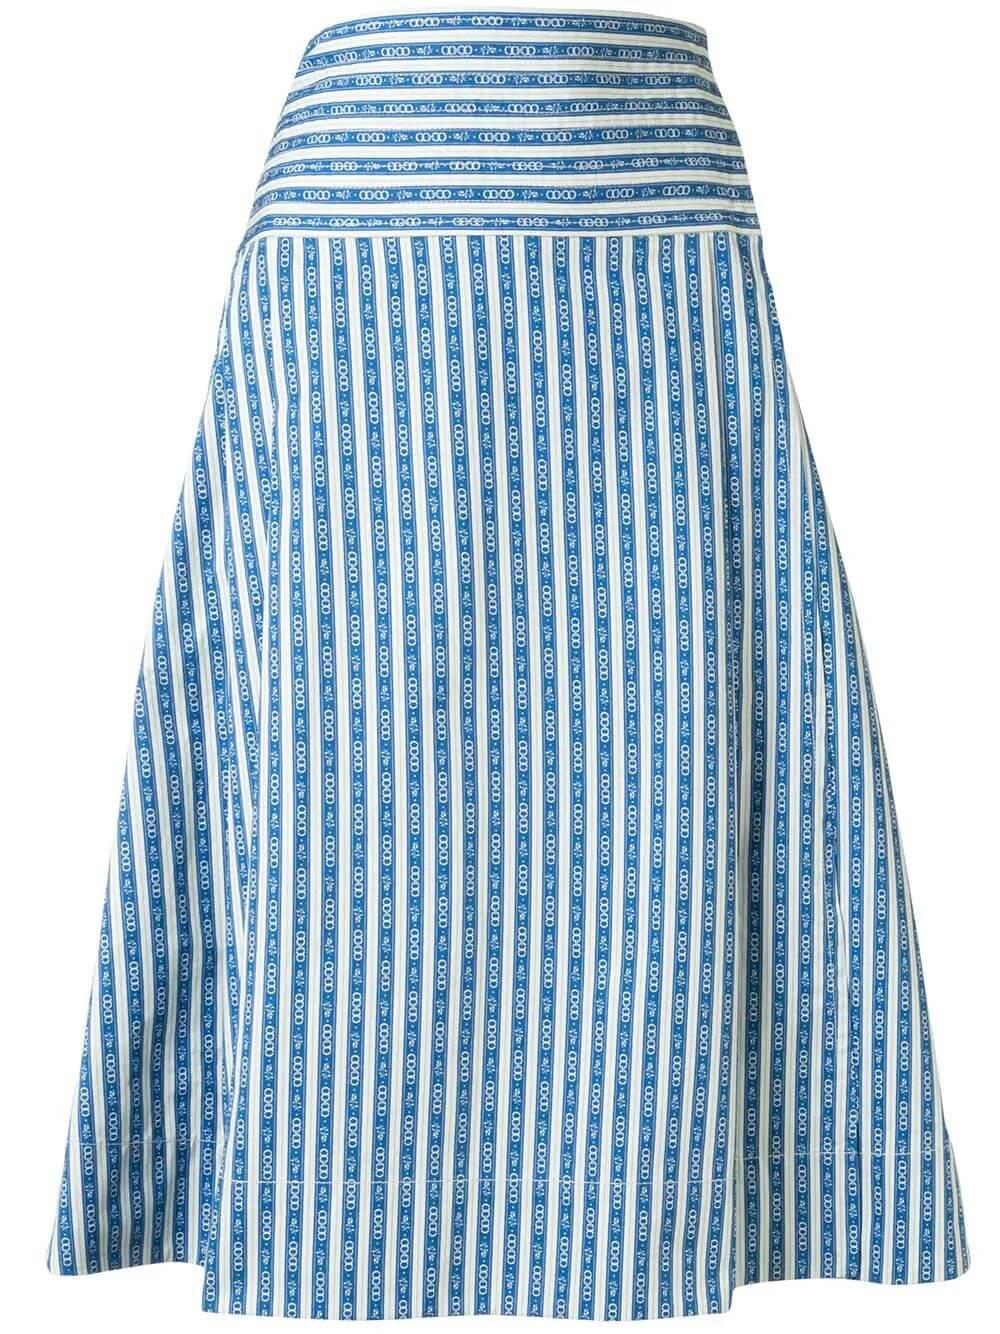 Gemini Link Striped Wrap Skirt